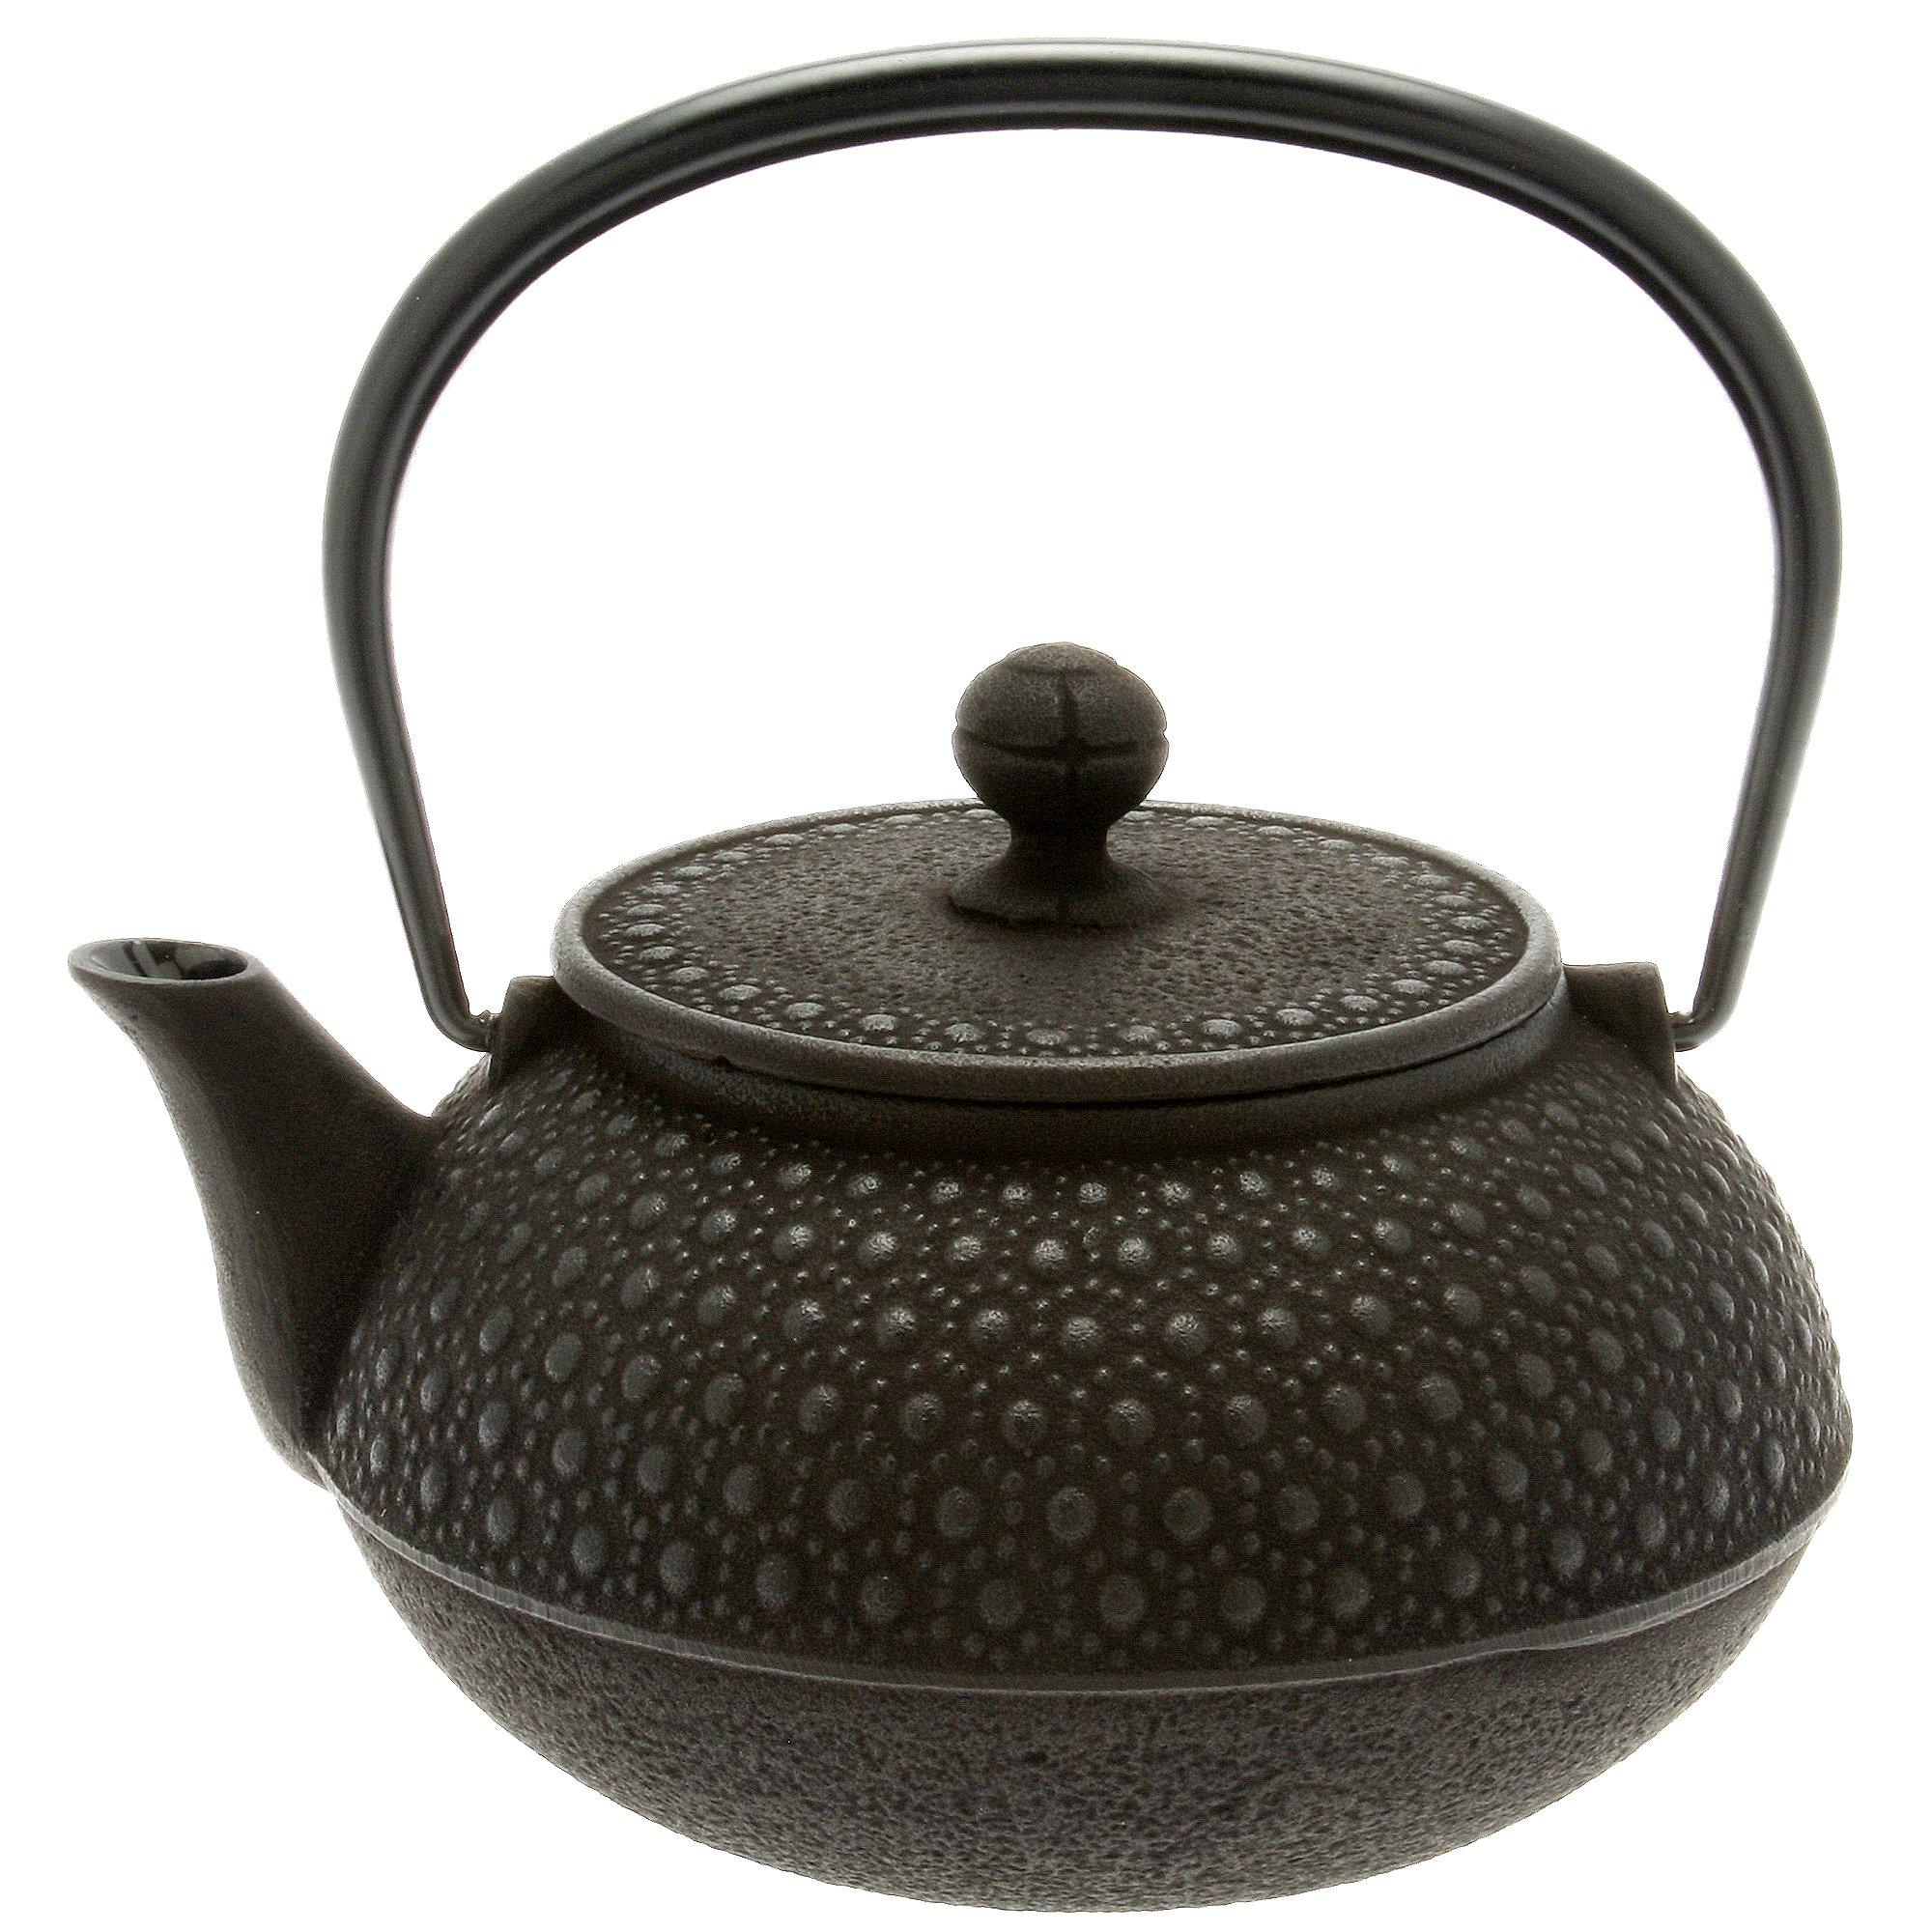 Iwachu Japanese Iron Tetsubin Teapot, 30-Ounce, Black Honeycomb